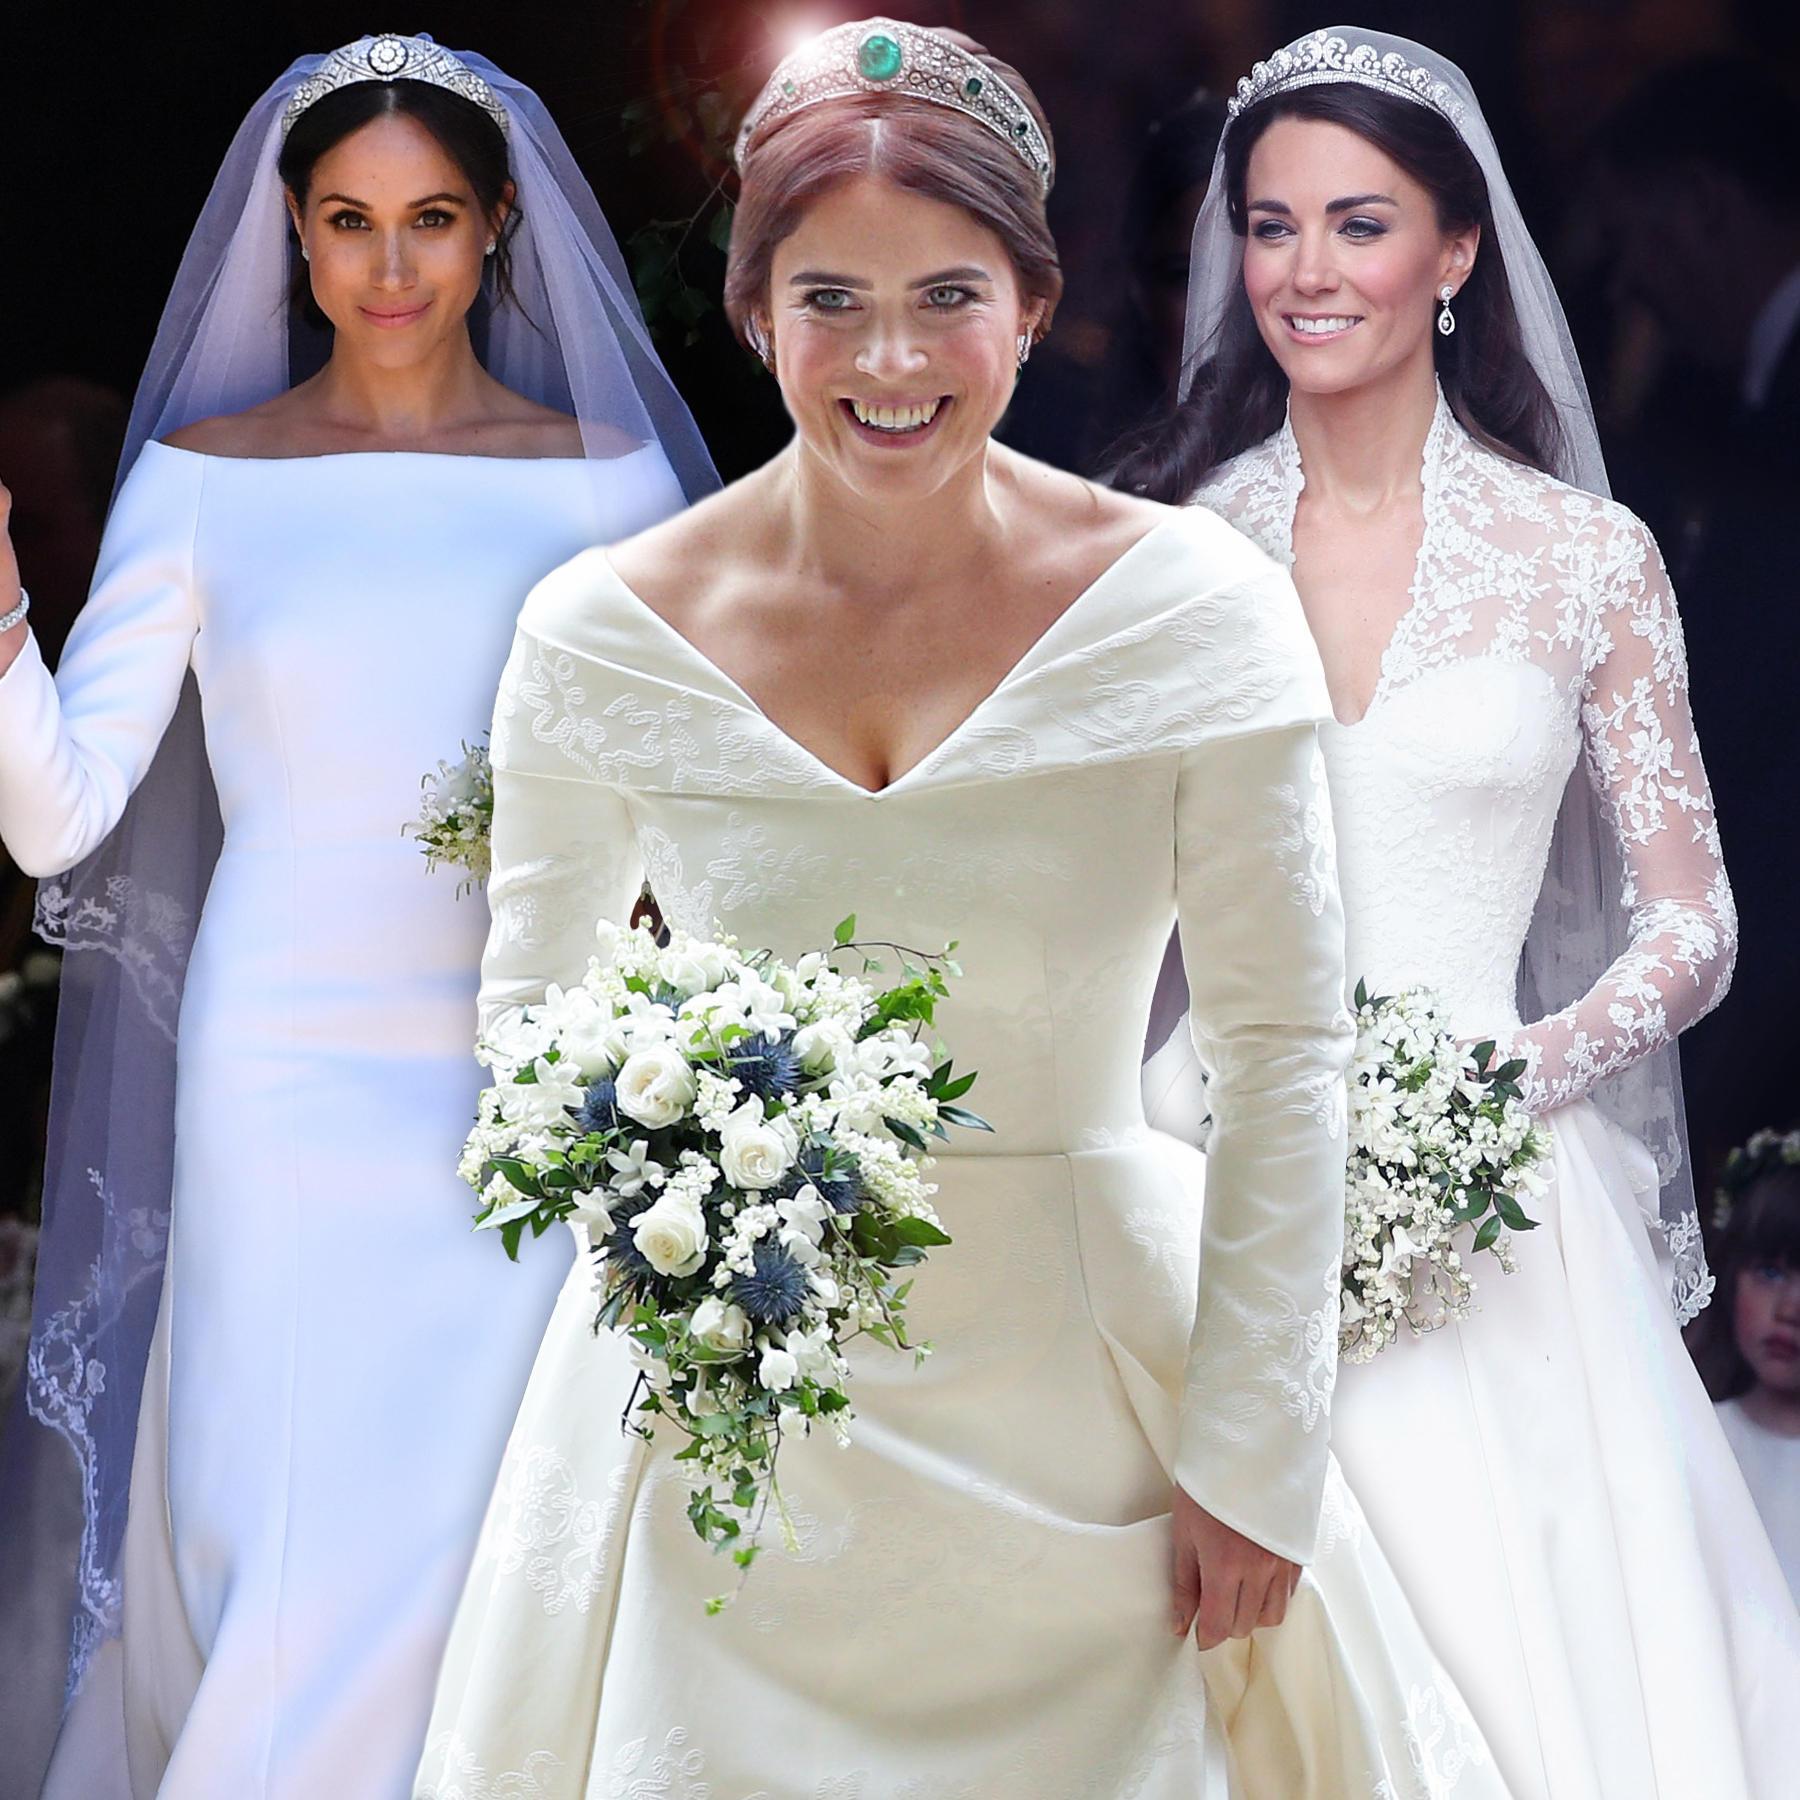 Royale Brautkleider: Kate, Meghan, Zara, Eugenie - Welcher